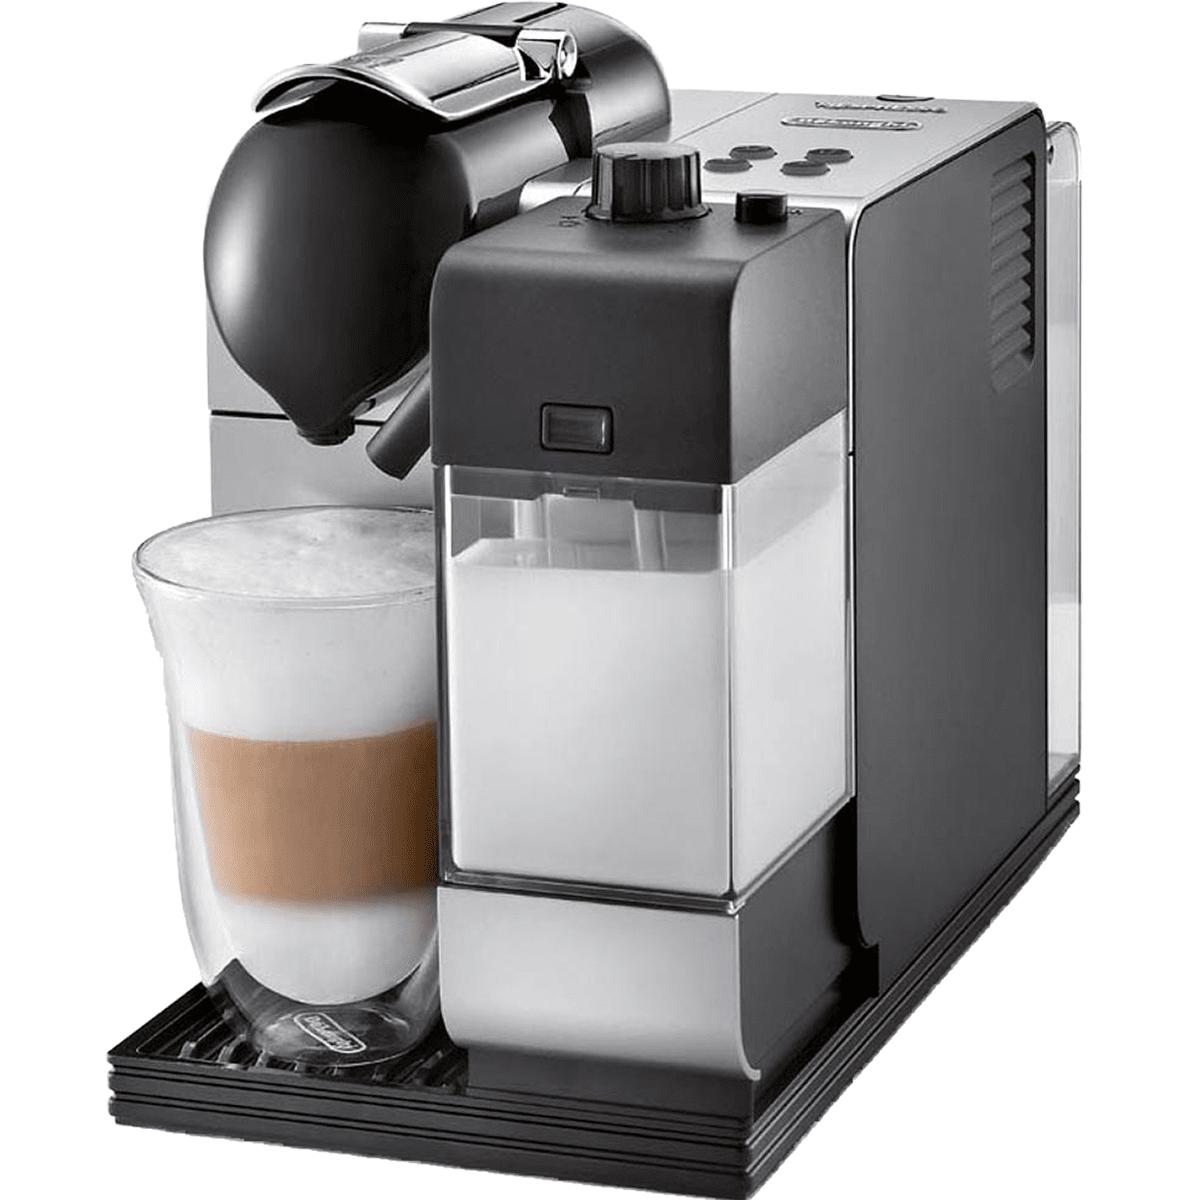 DeLonghi EN520 Lattissima Capsule Espresso Machine Silver - EN520SLW